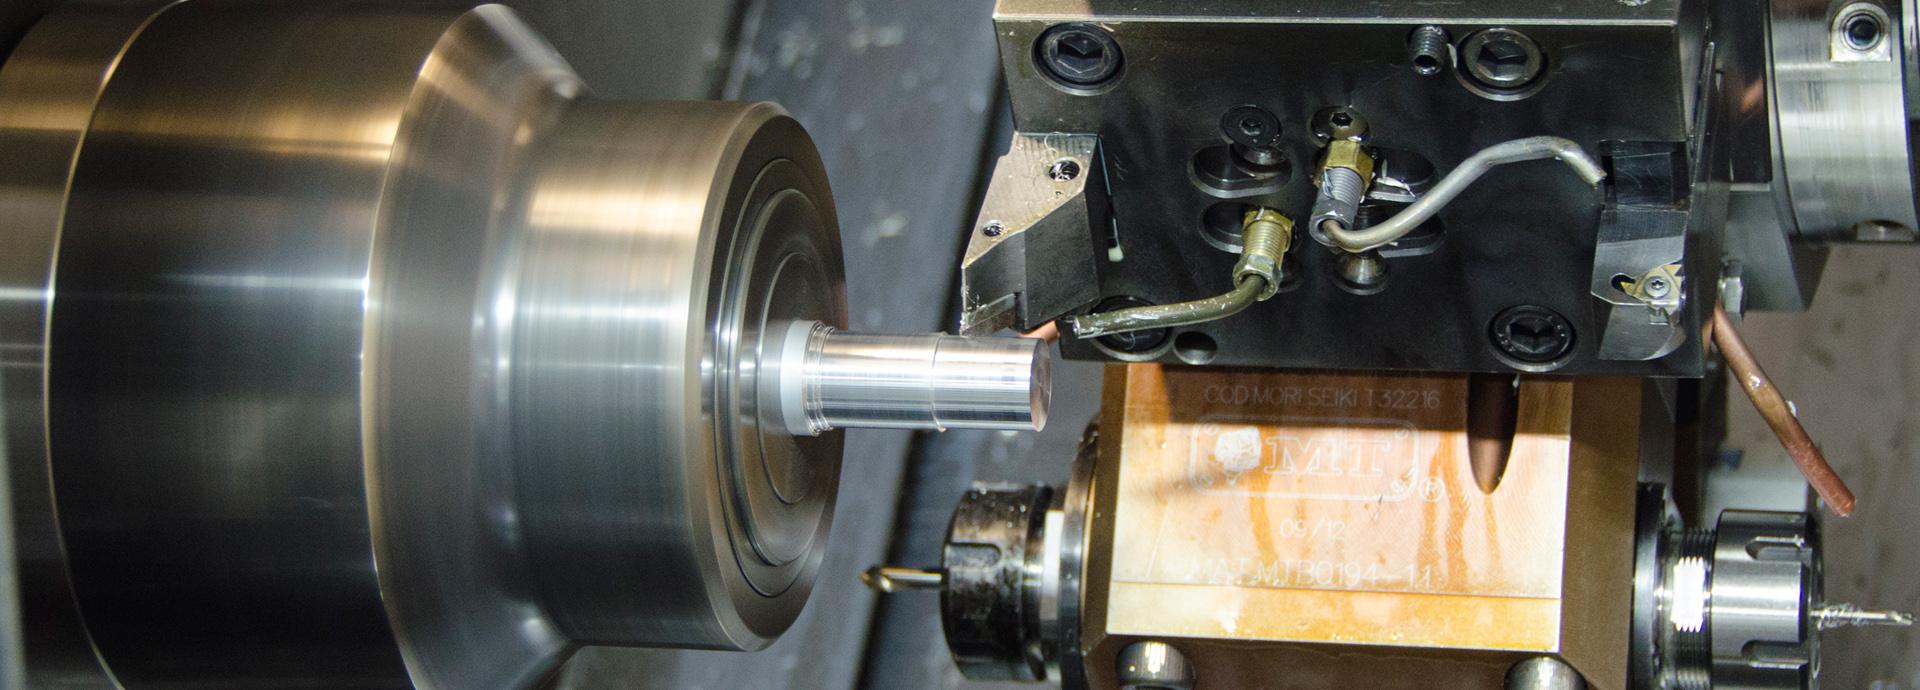 CNC lathe | Horschel Brothers Precision - Springville, NY